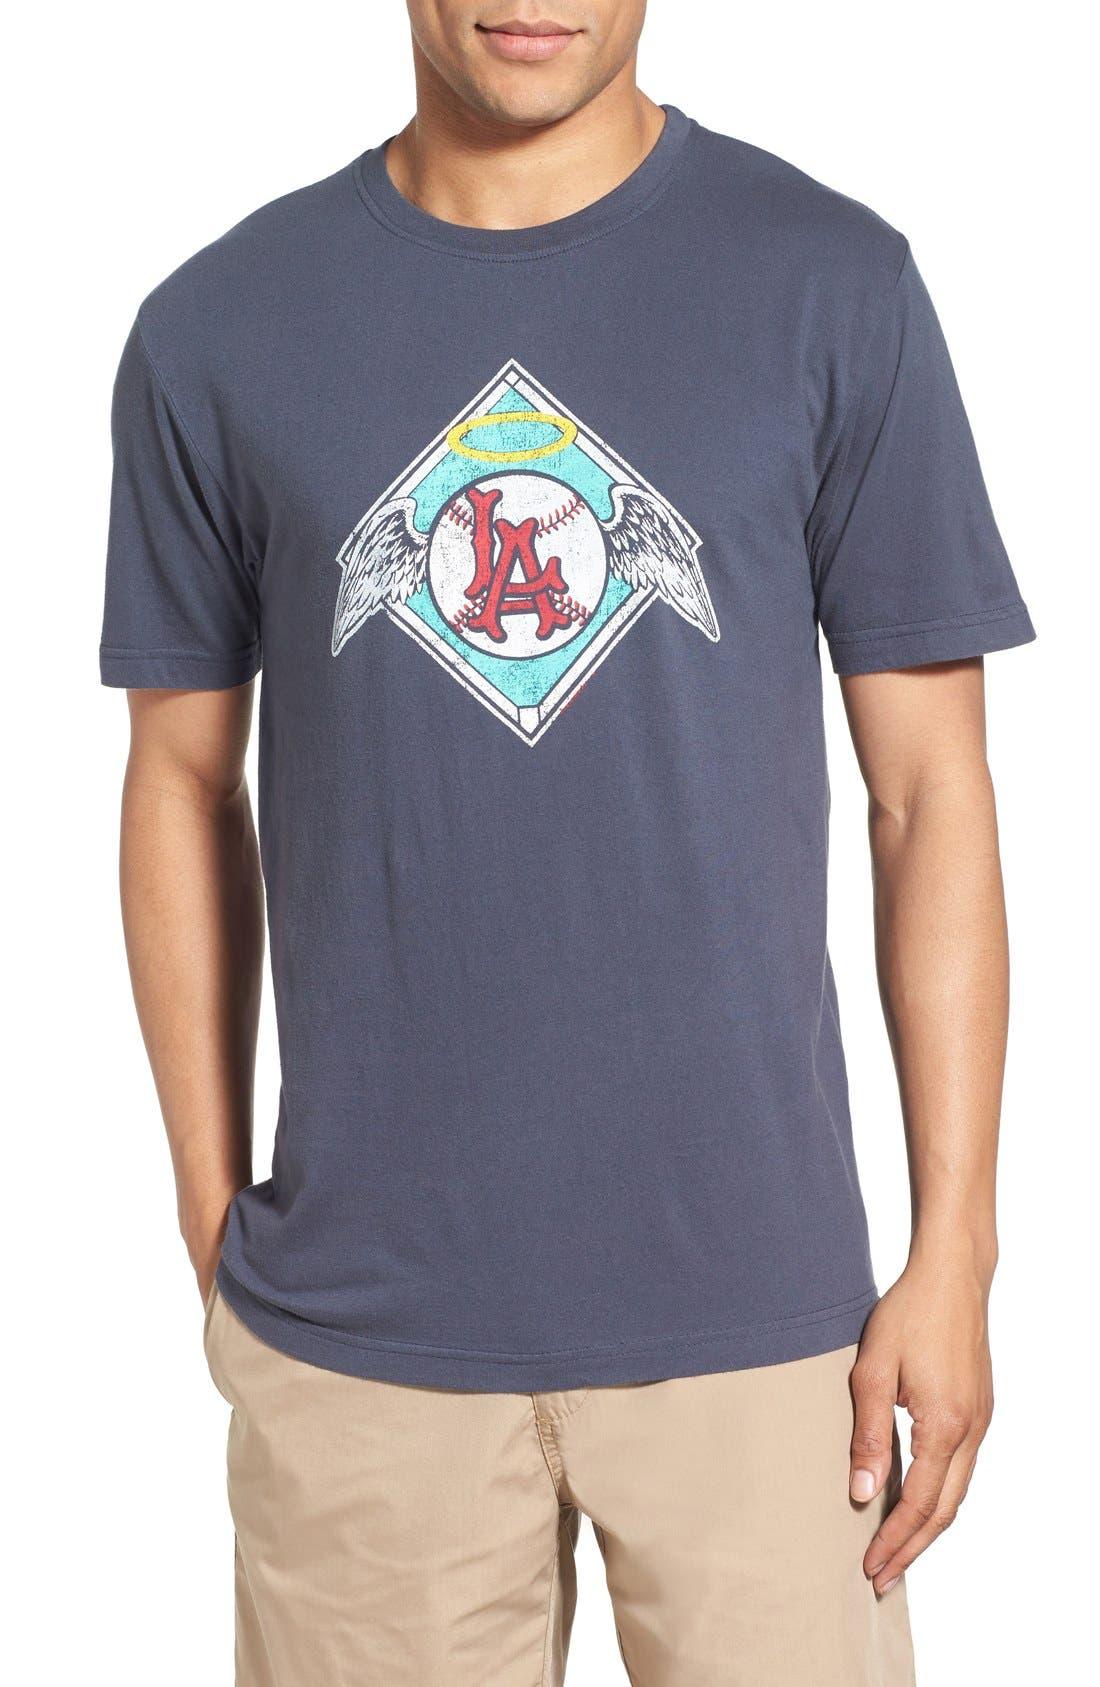 Red Jacket 'Los Angeles Angels - Brass Tacks' Trim Fit T-Shirt